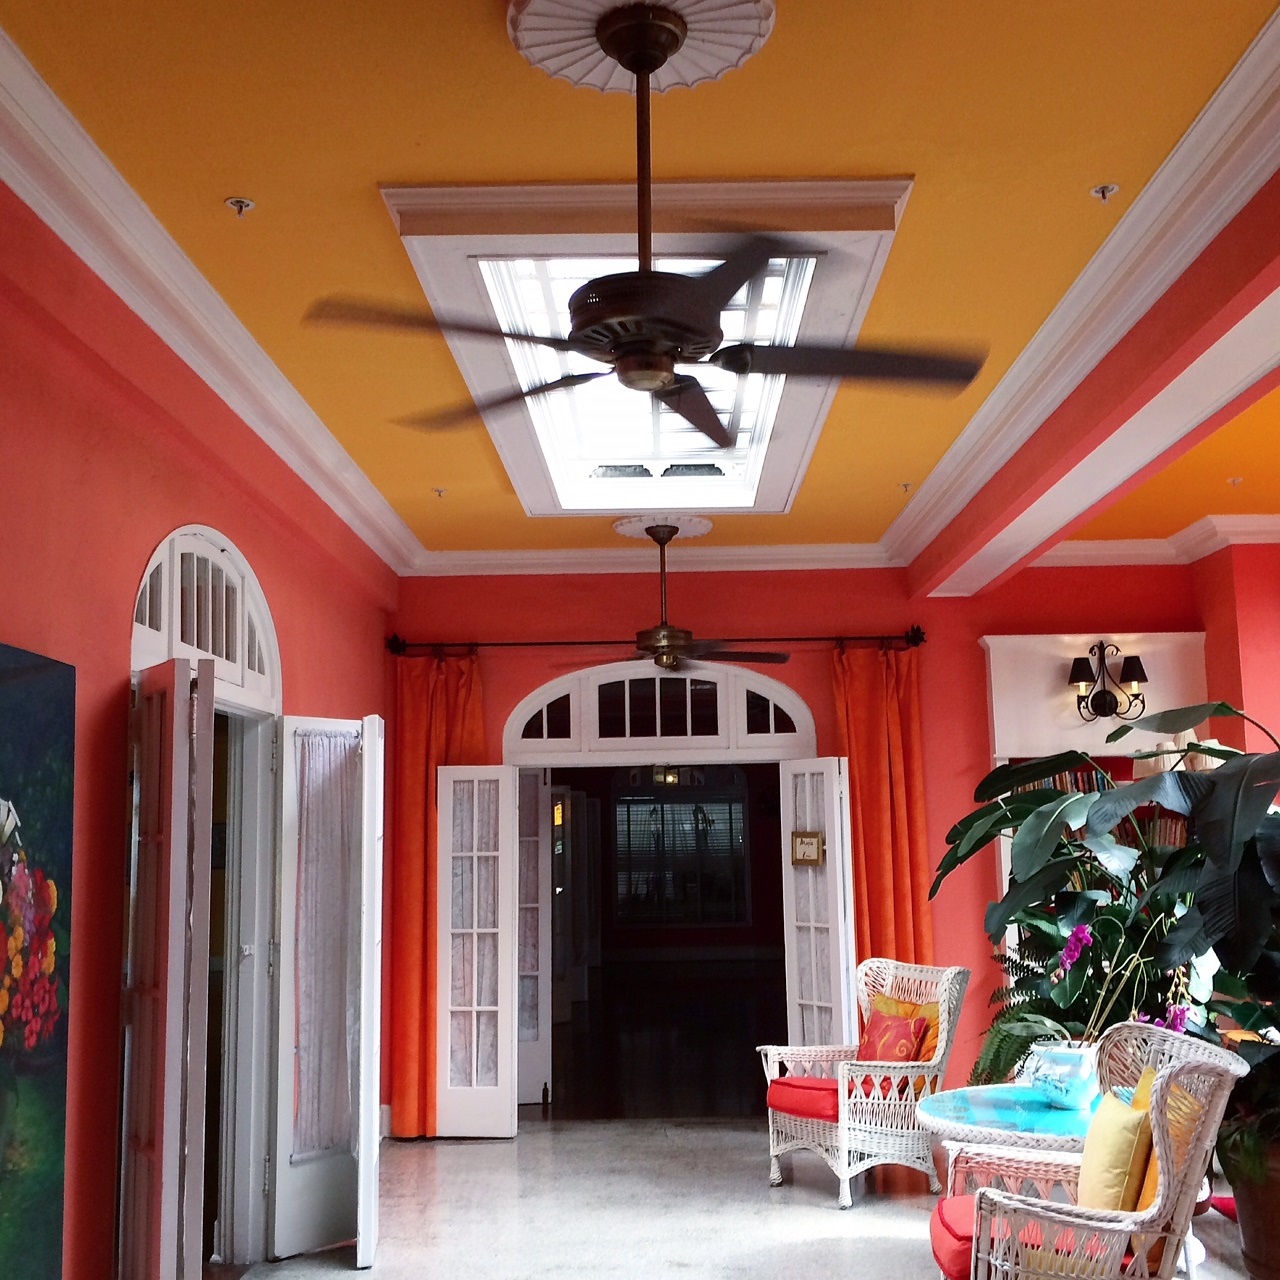 The bright lobby of the Colony Hotel